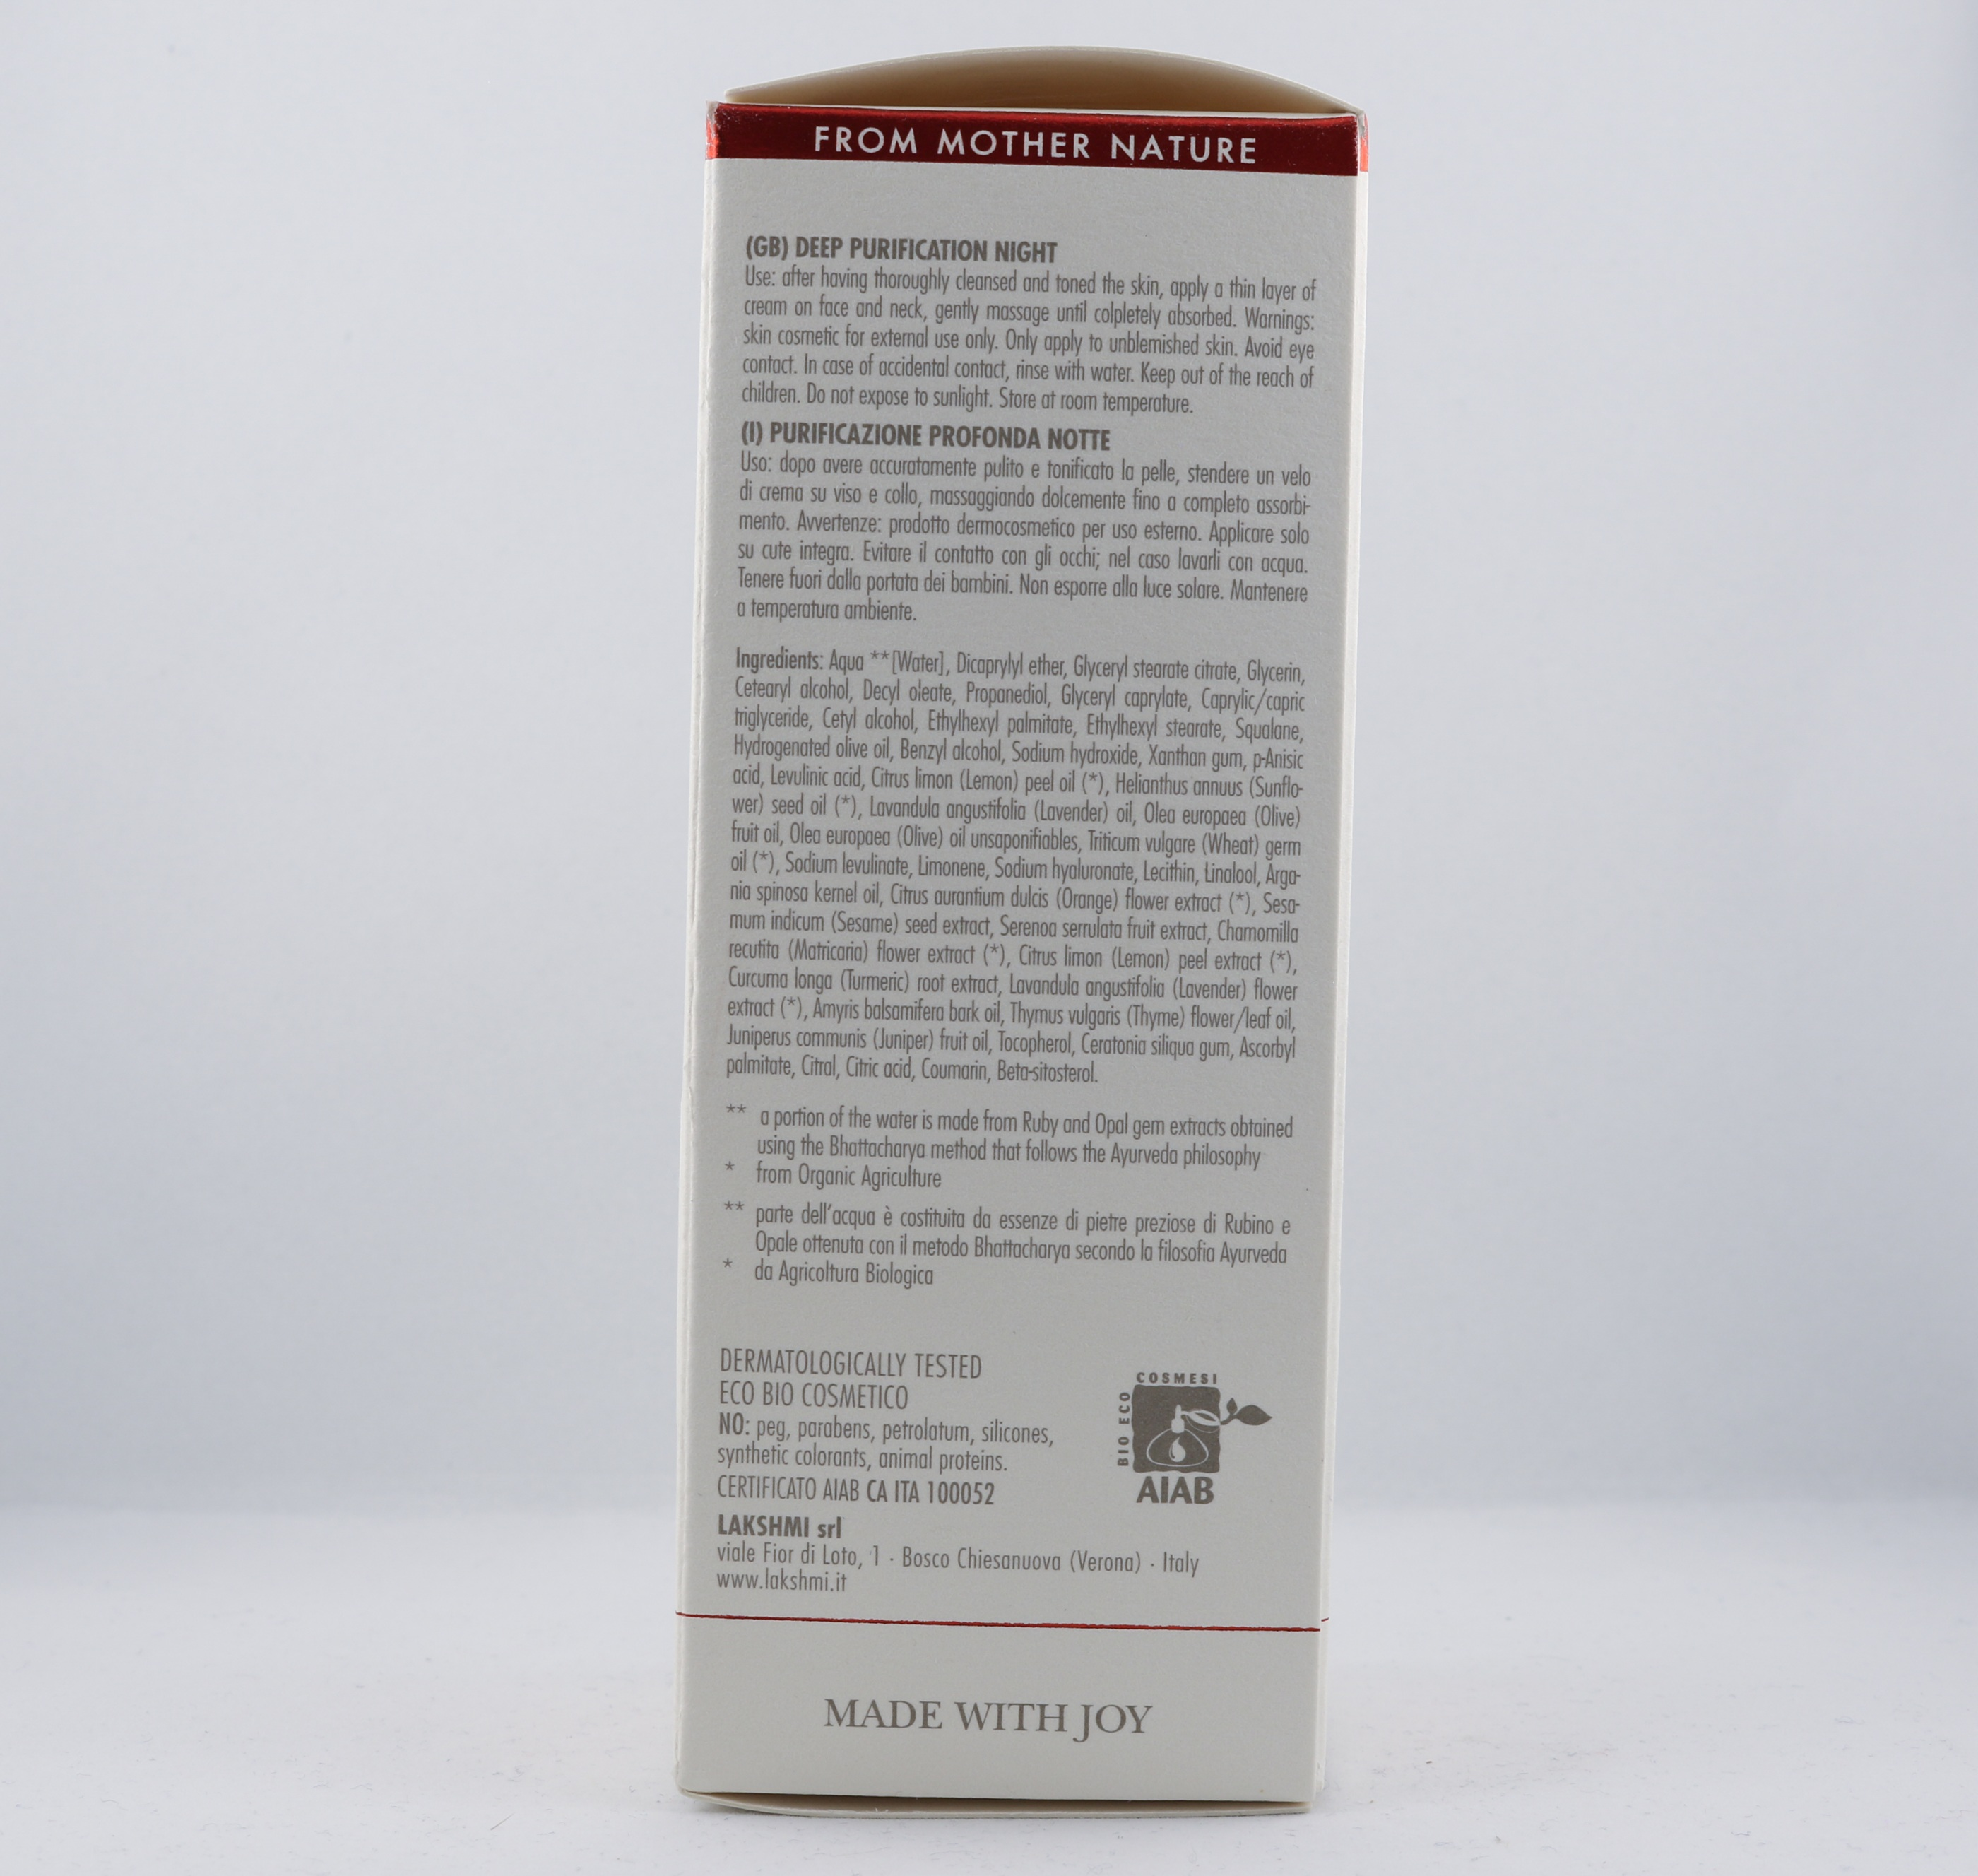 Kapha Tumeric Cream wellness ayurveda halmstad sweden svensk hudvård